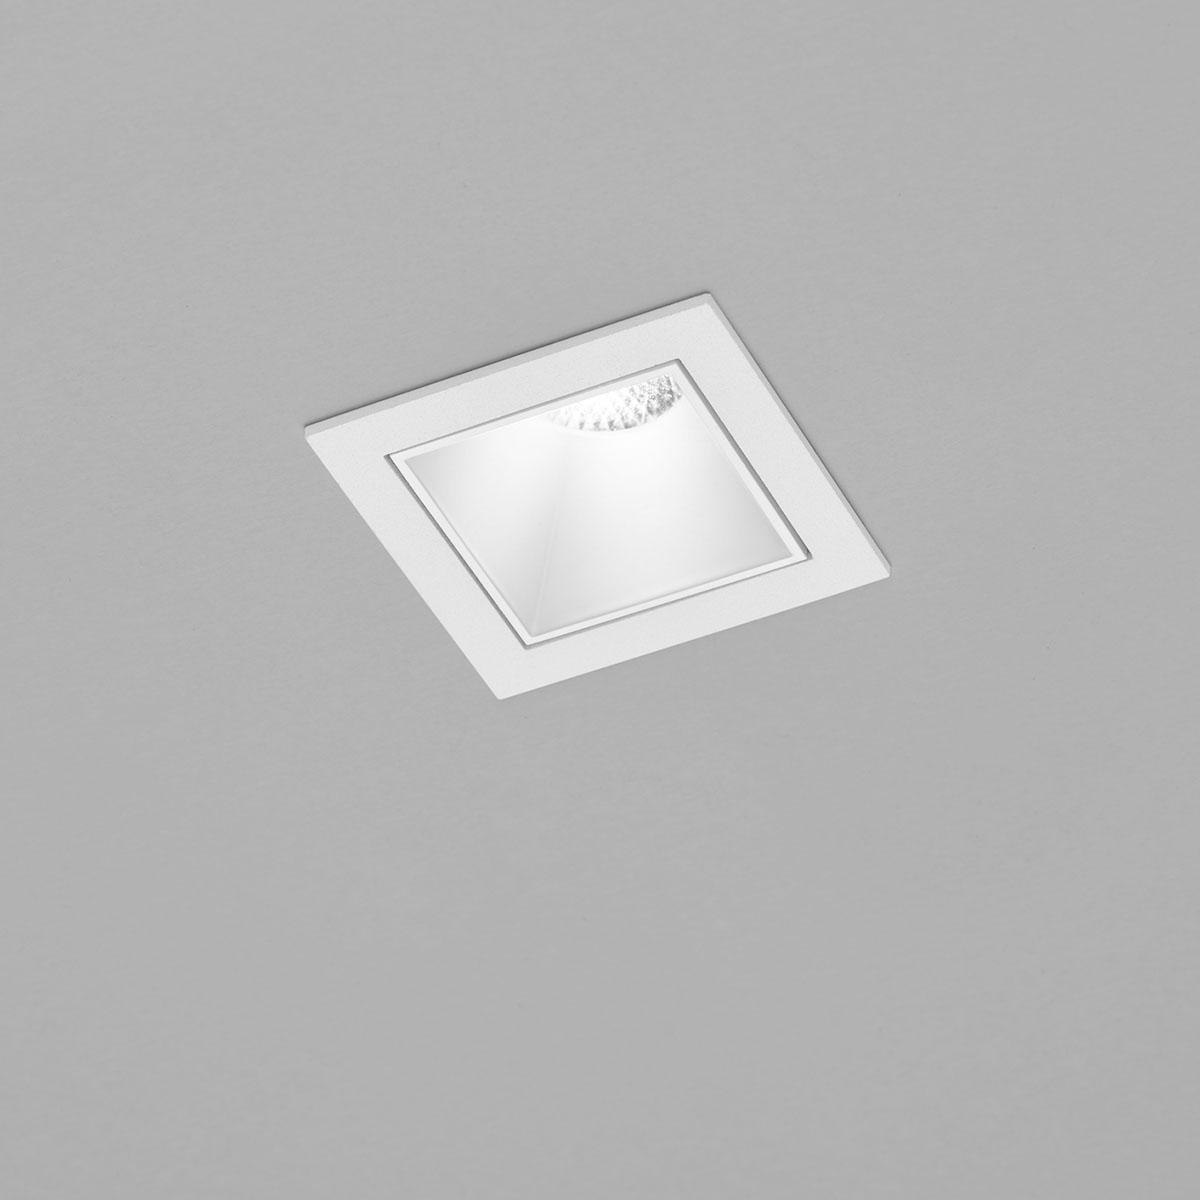 Helestra Pic LED Deckeneinbaustrahler, eckig, weiß